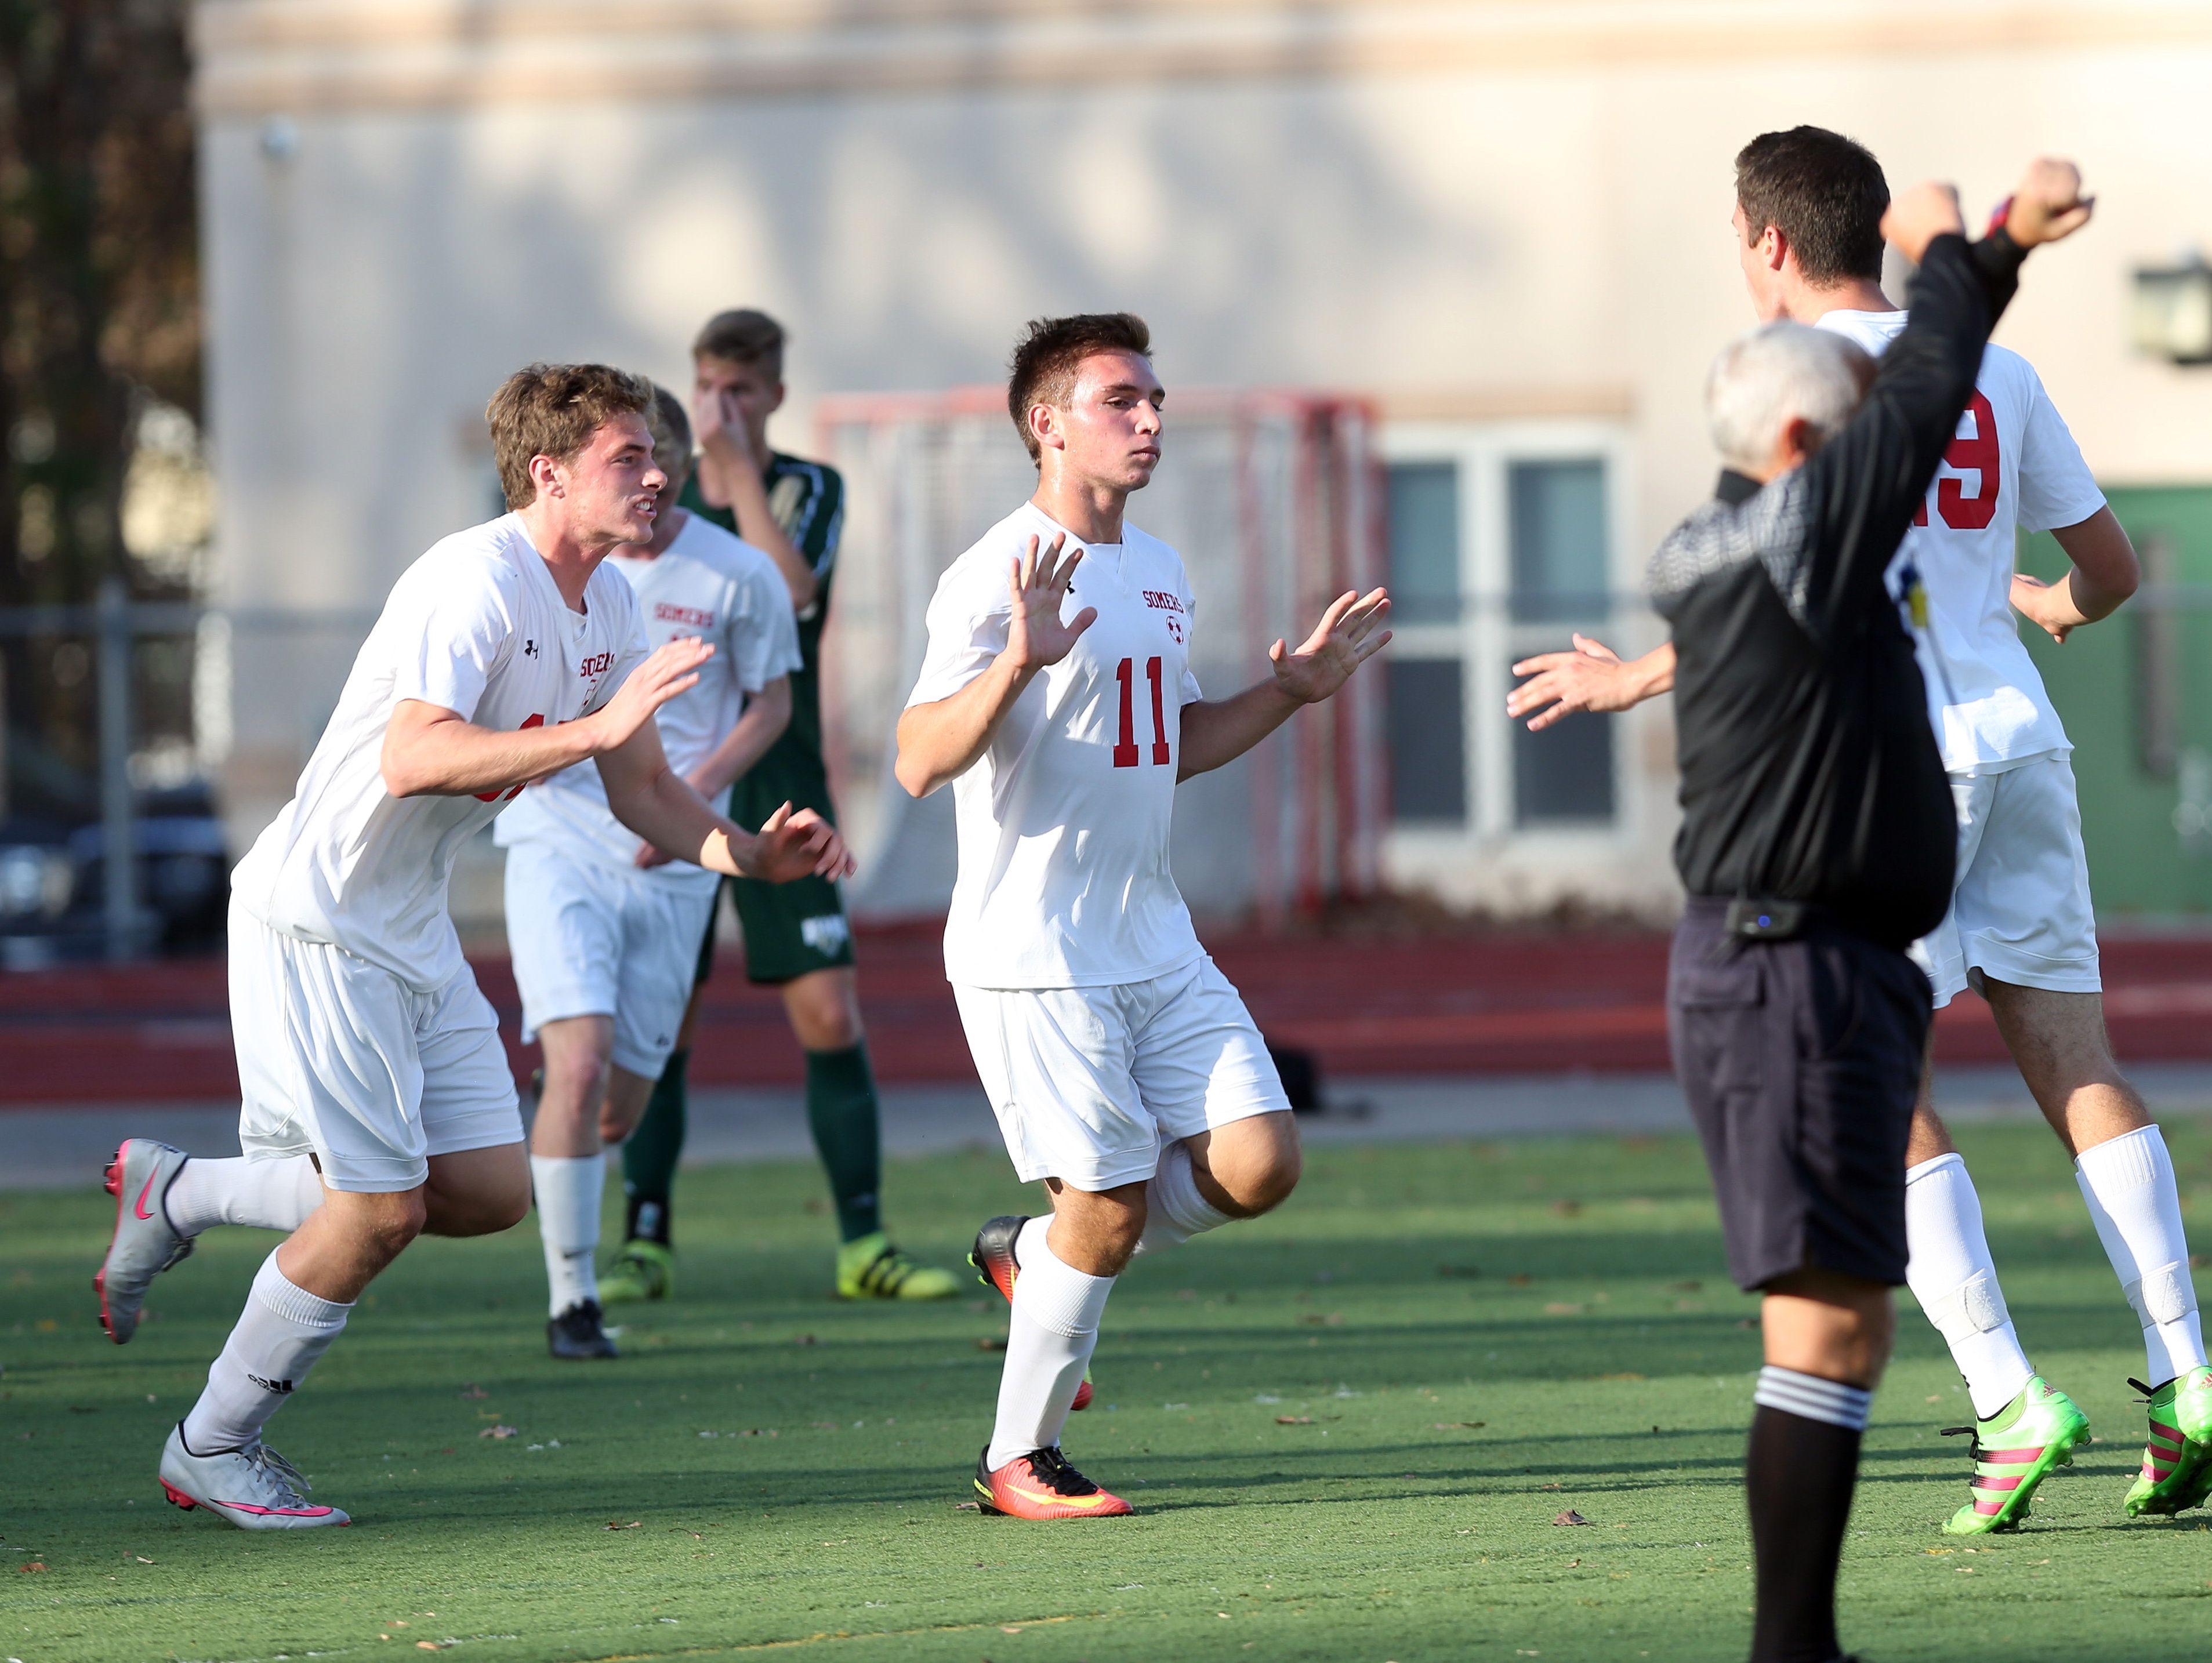 Somers defeated Vestal in the boys soccer regional semifinal at Lakeland High School in Shrub Oak Nov. 2, 2016